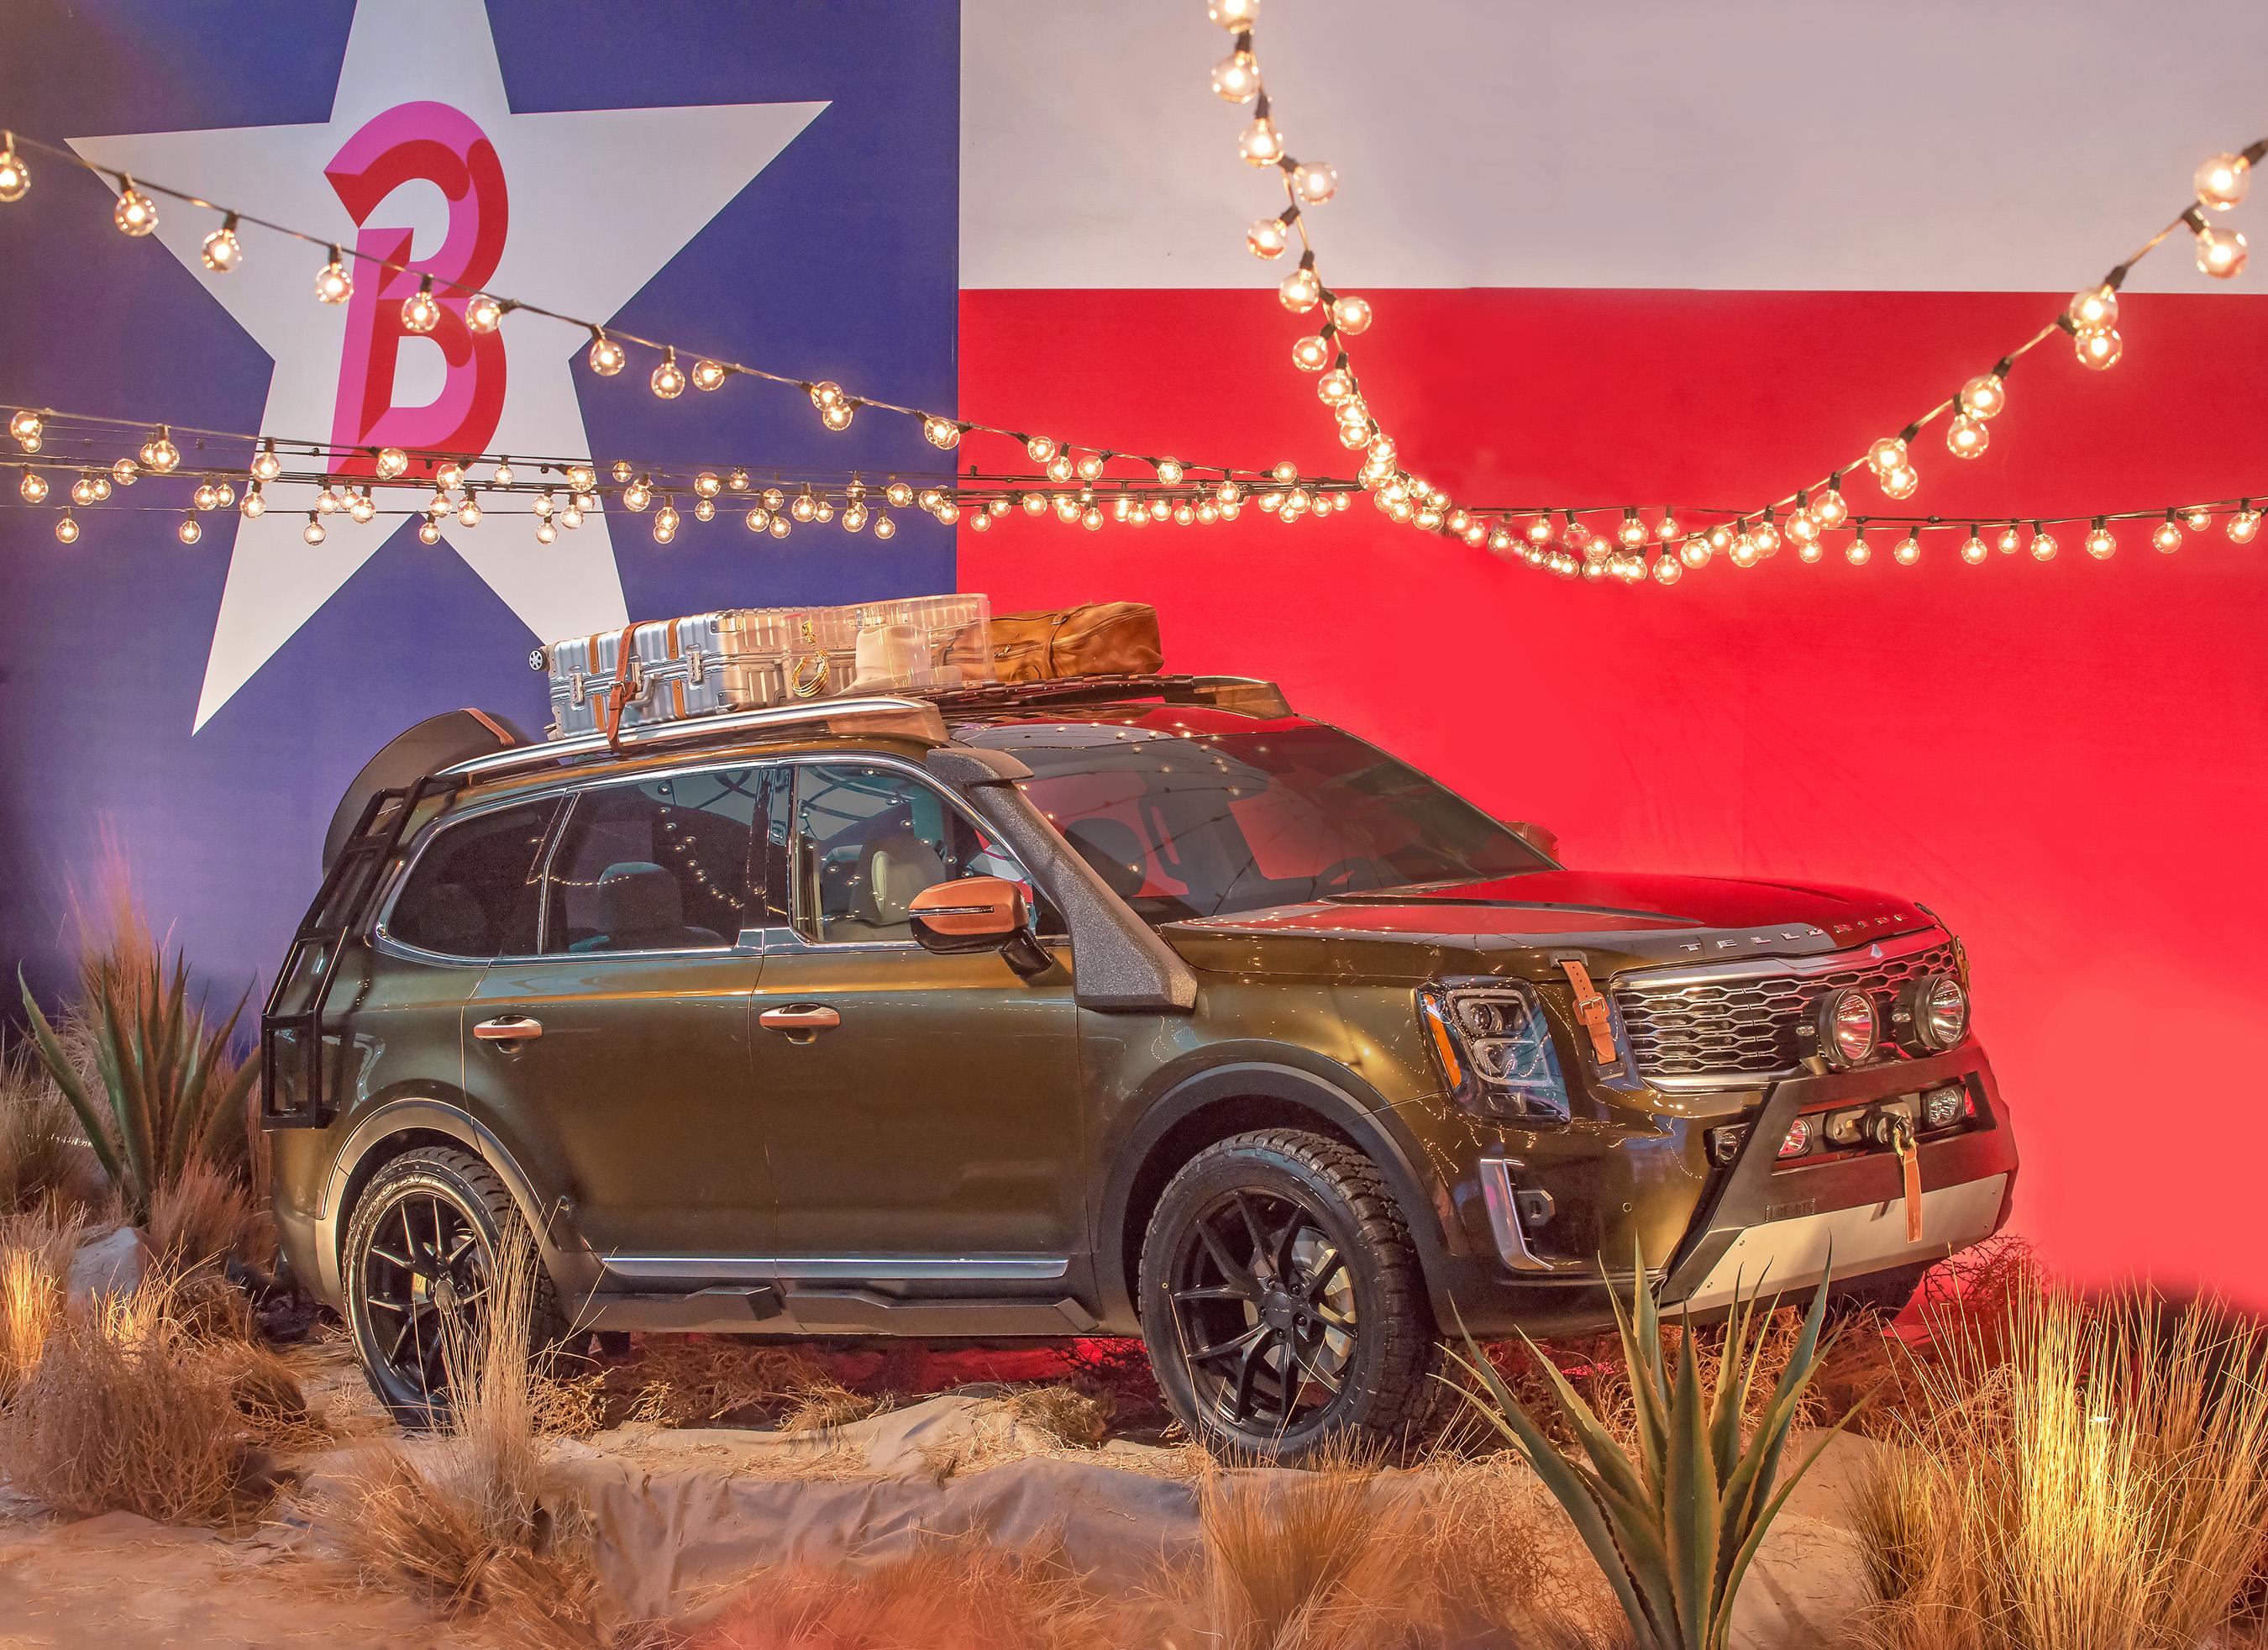 Kia previews all-new Telluride SUV on Brandon Maxwell's runway at New York Fashion Week.